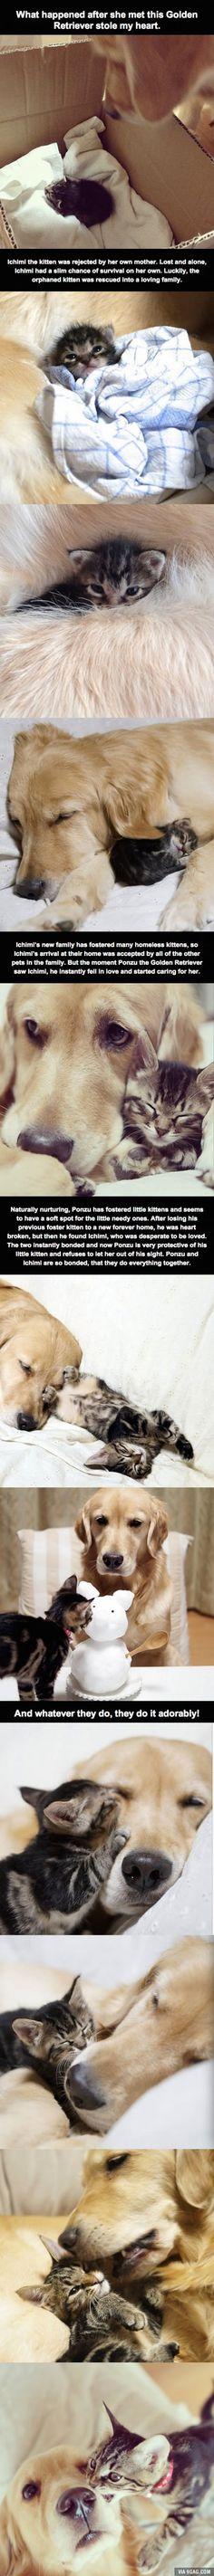 Golden retriever bonding to rejected kitten to keep it safe.. awwwww melted my heart